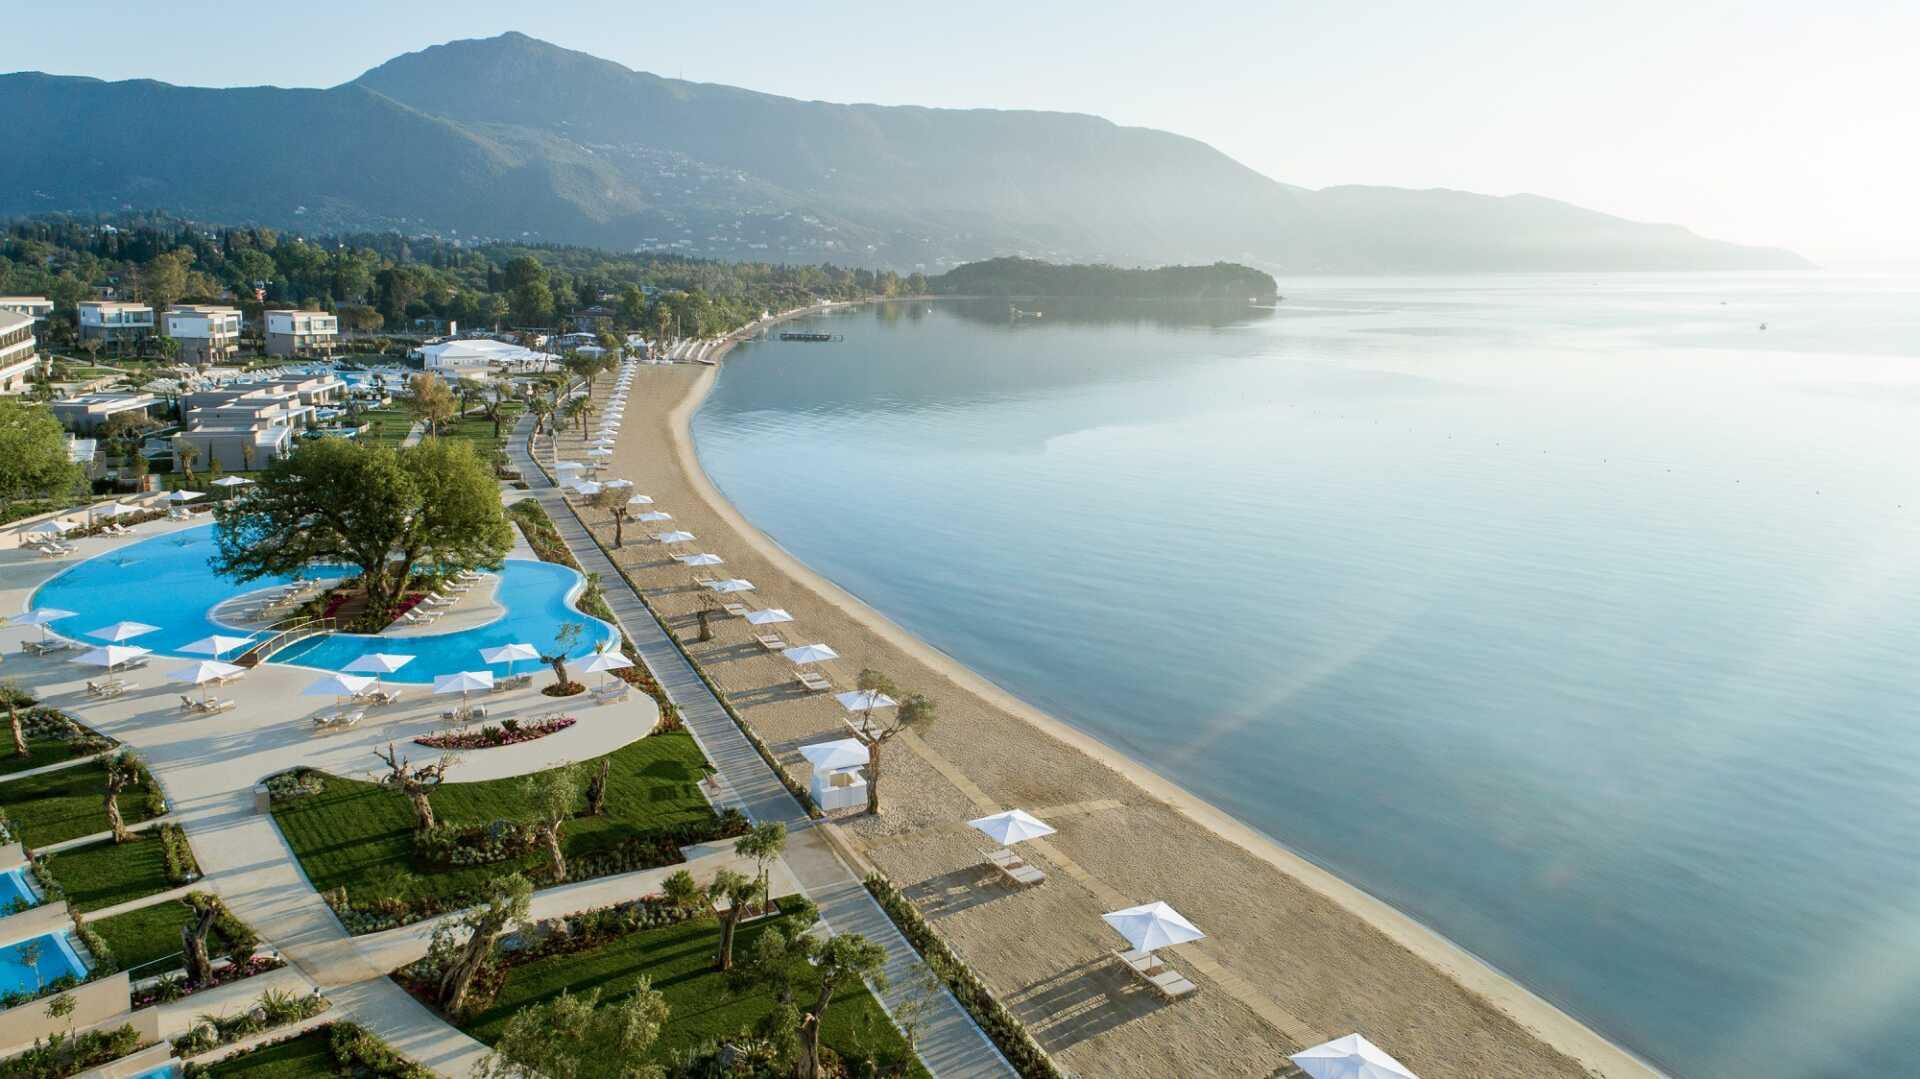 Ikos Dassia-Krf-Jumbo Travel-hotel overview